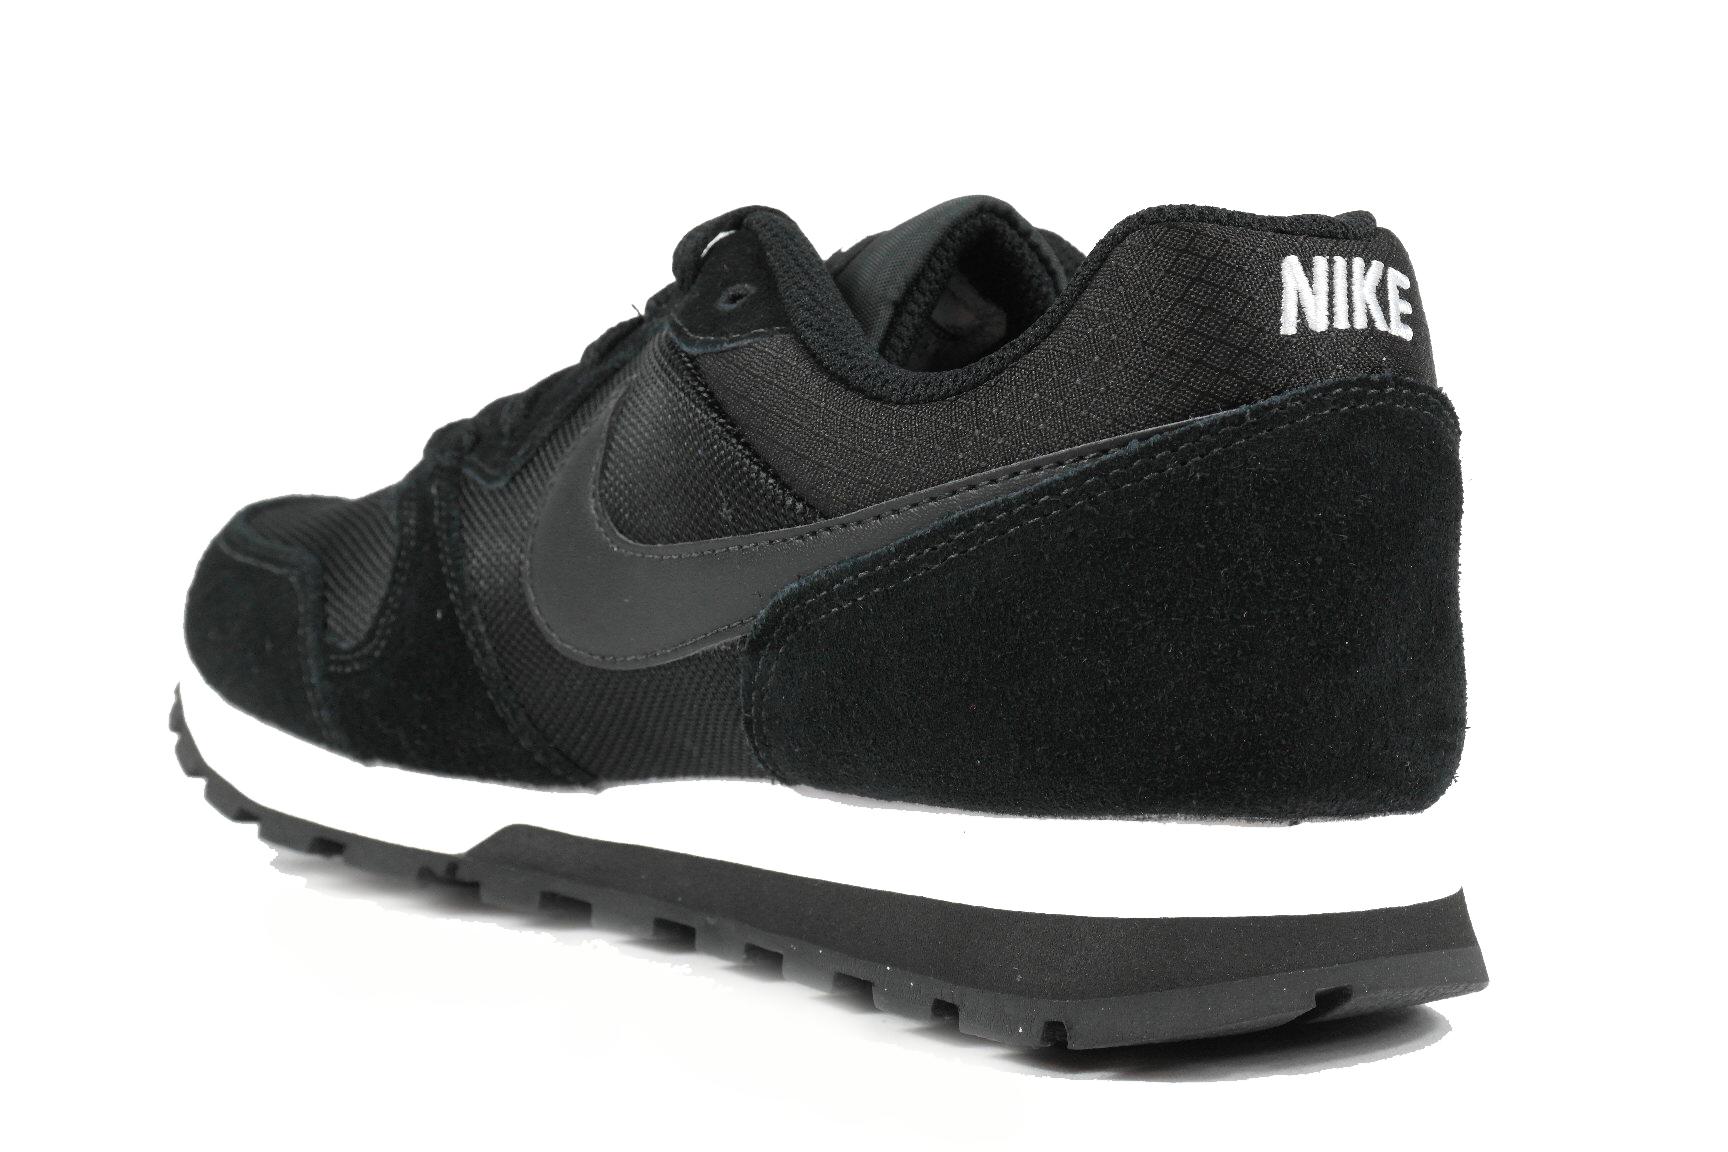 05cb70b9a8b ... Nike MD Runner dames sneakers zwart ...